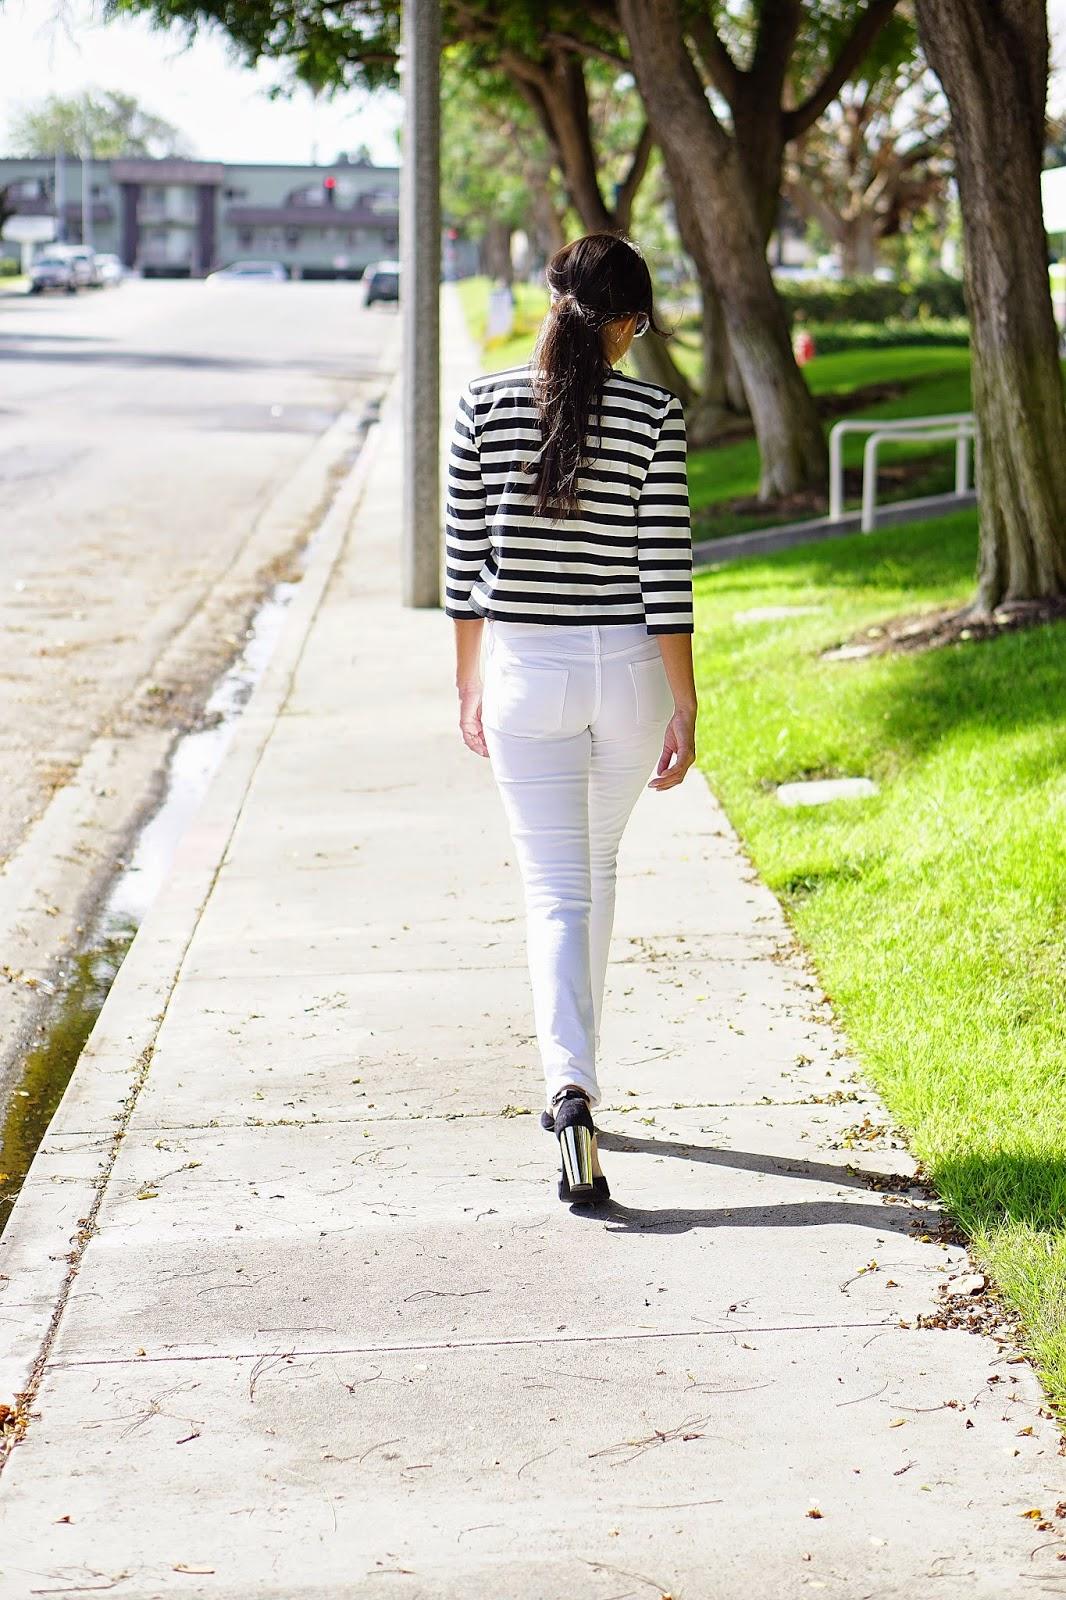 JCPenney, MNG by Mango Striped Crop Top, White Jeans, Arizona Skinny Jeans, Shoemint Penny Heels, Shoemint Heels, Chilli Beans Sunglasses, Altuzarra for Target Black Blazer, Black Blazer, Target,